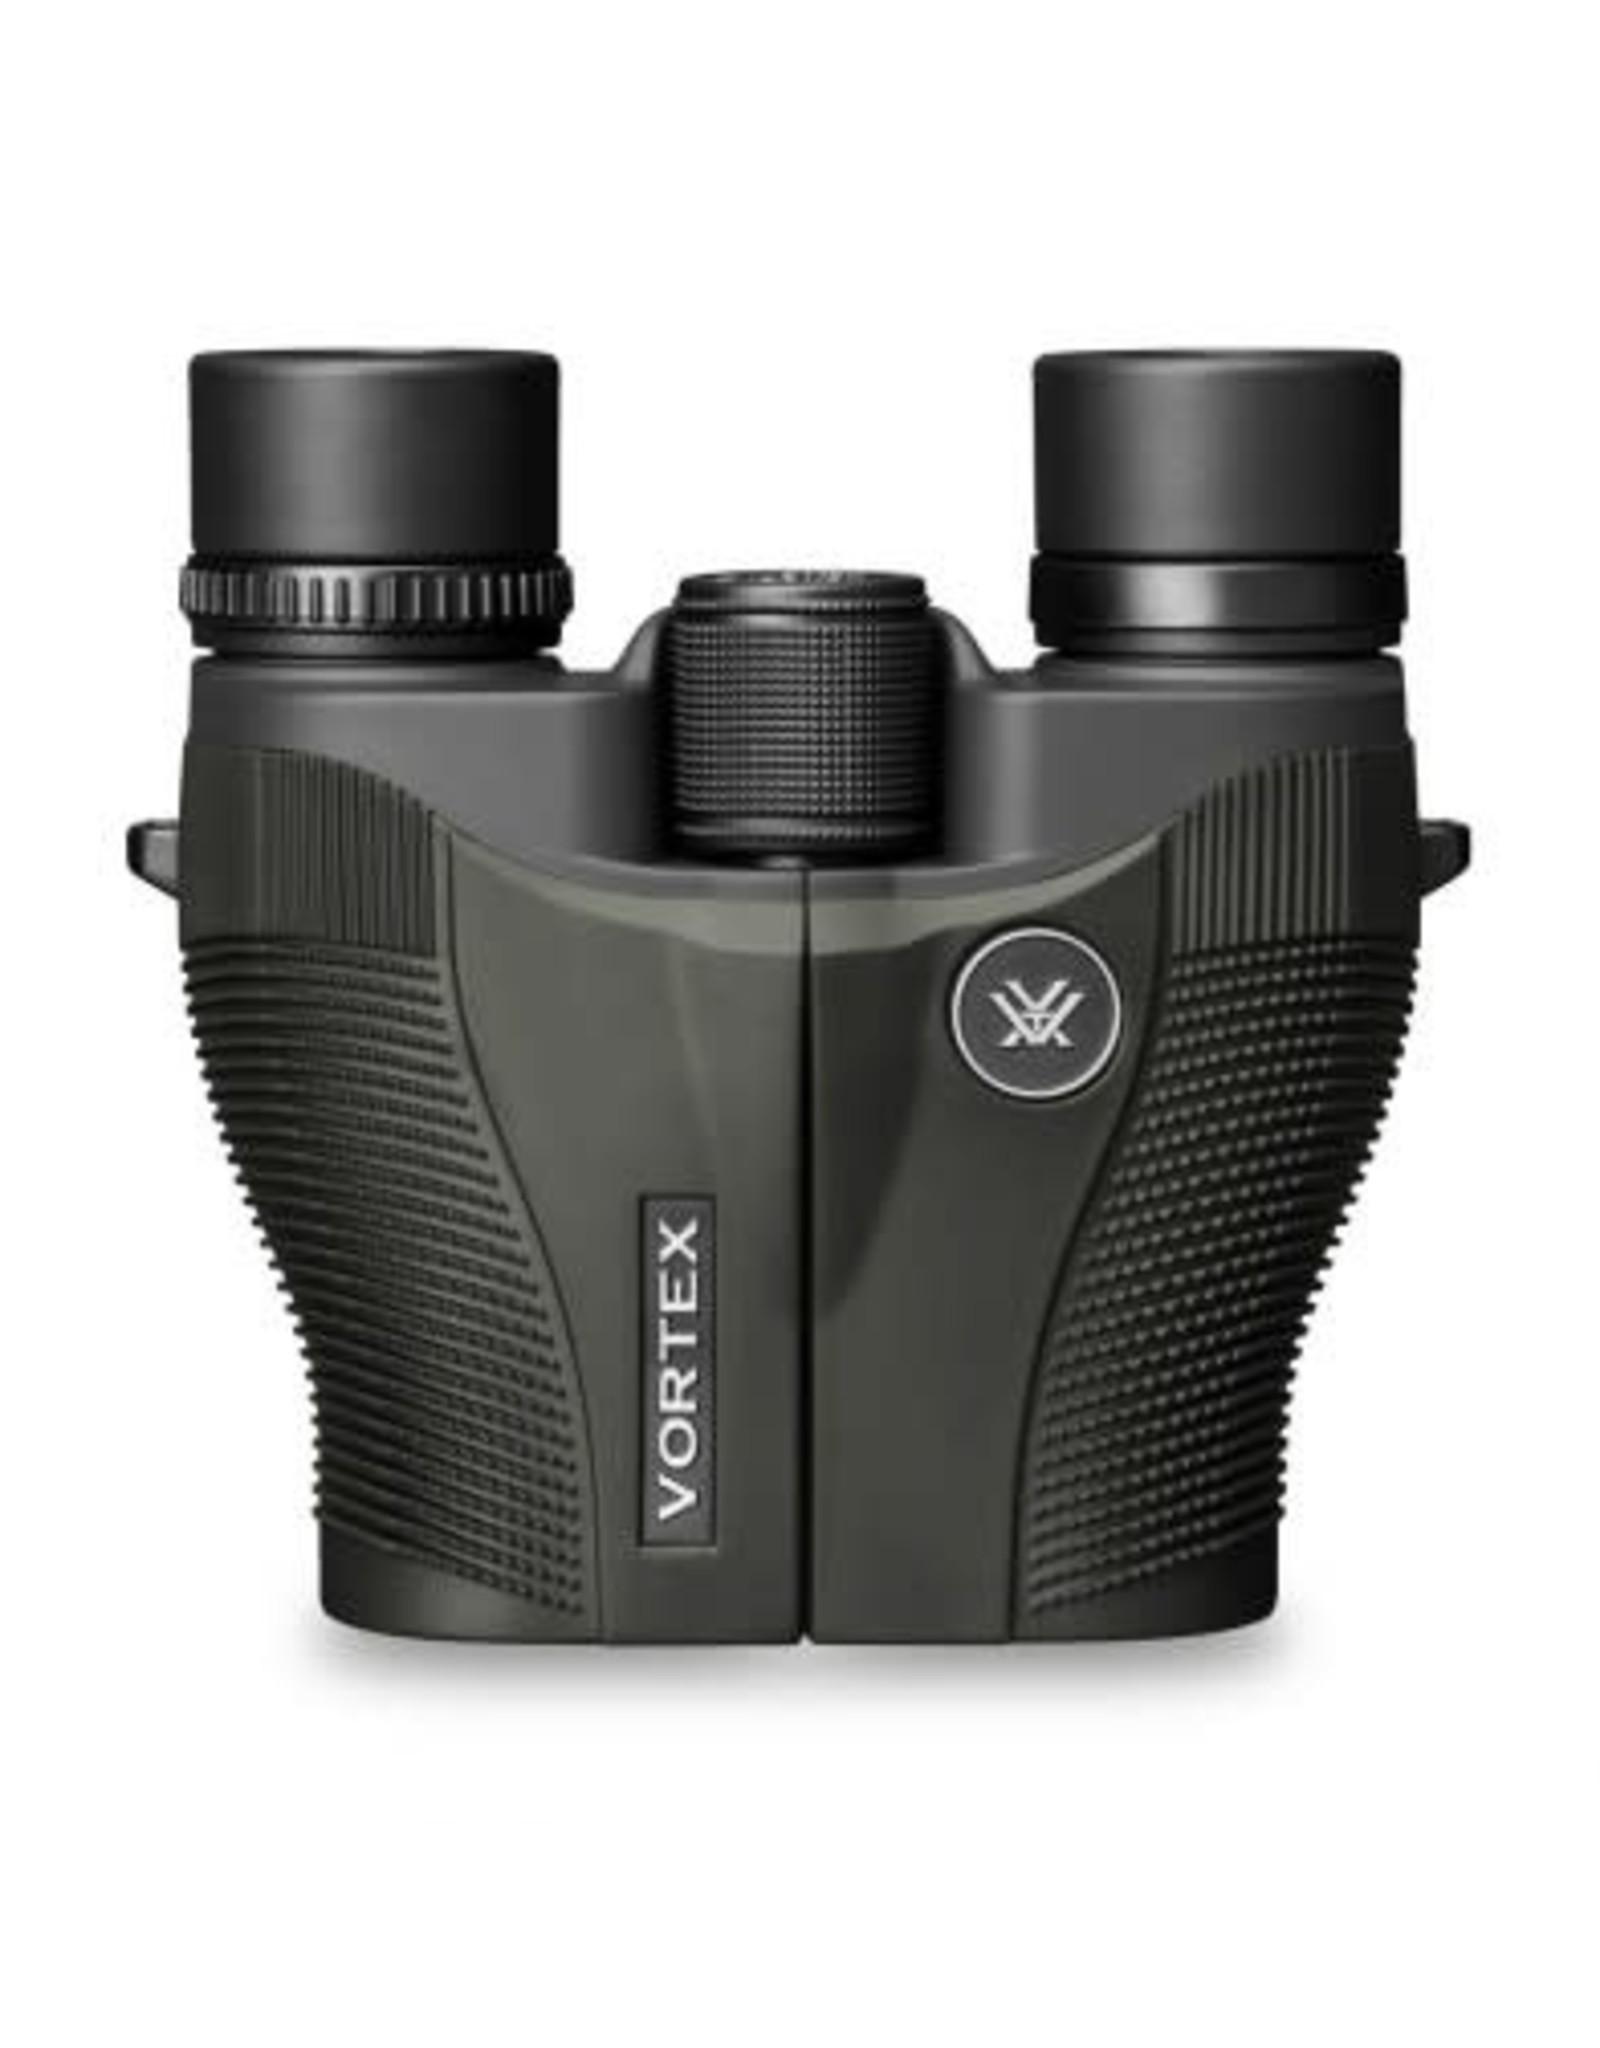 Vortex Optics VORTEX VANQUISH 10X26 BINOCULARS